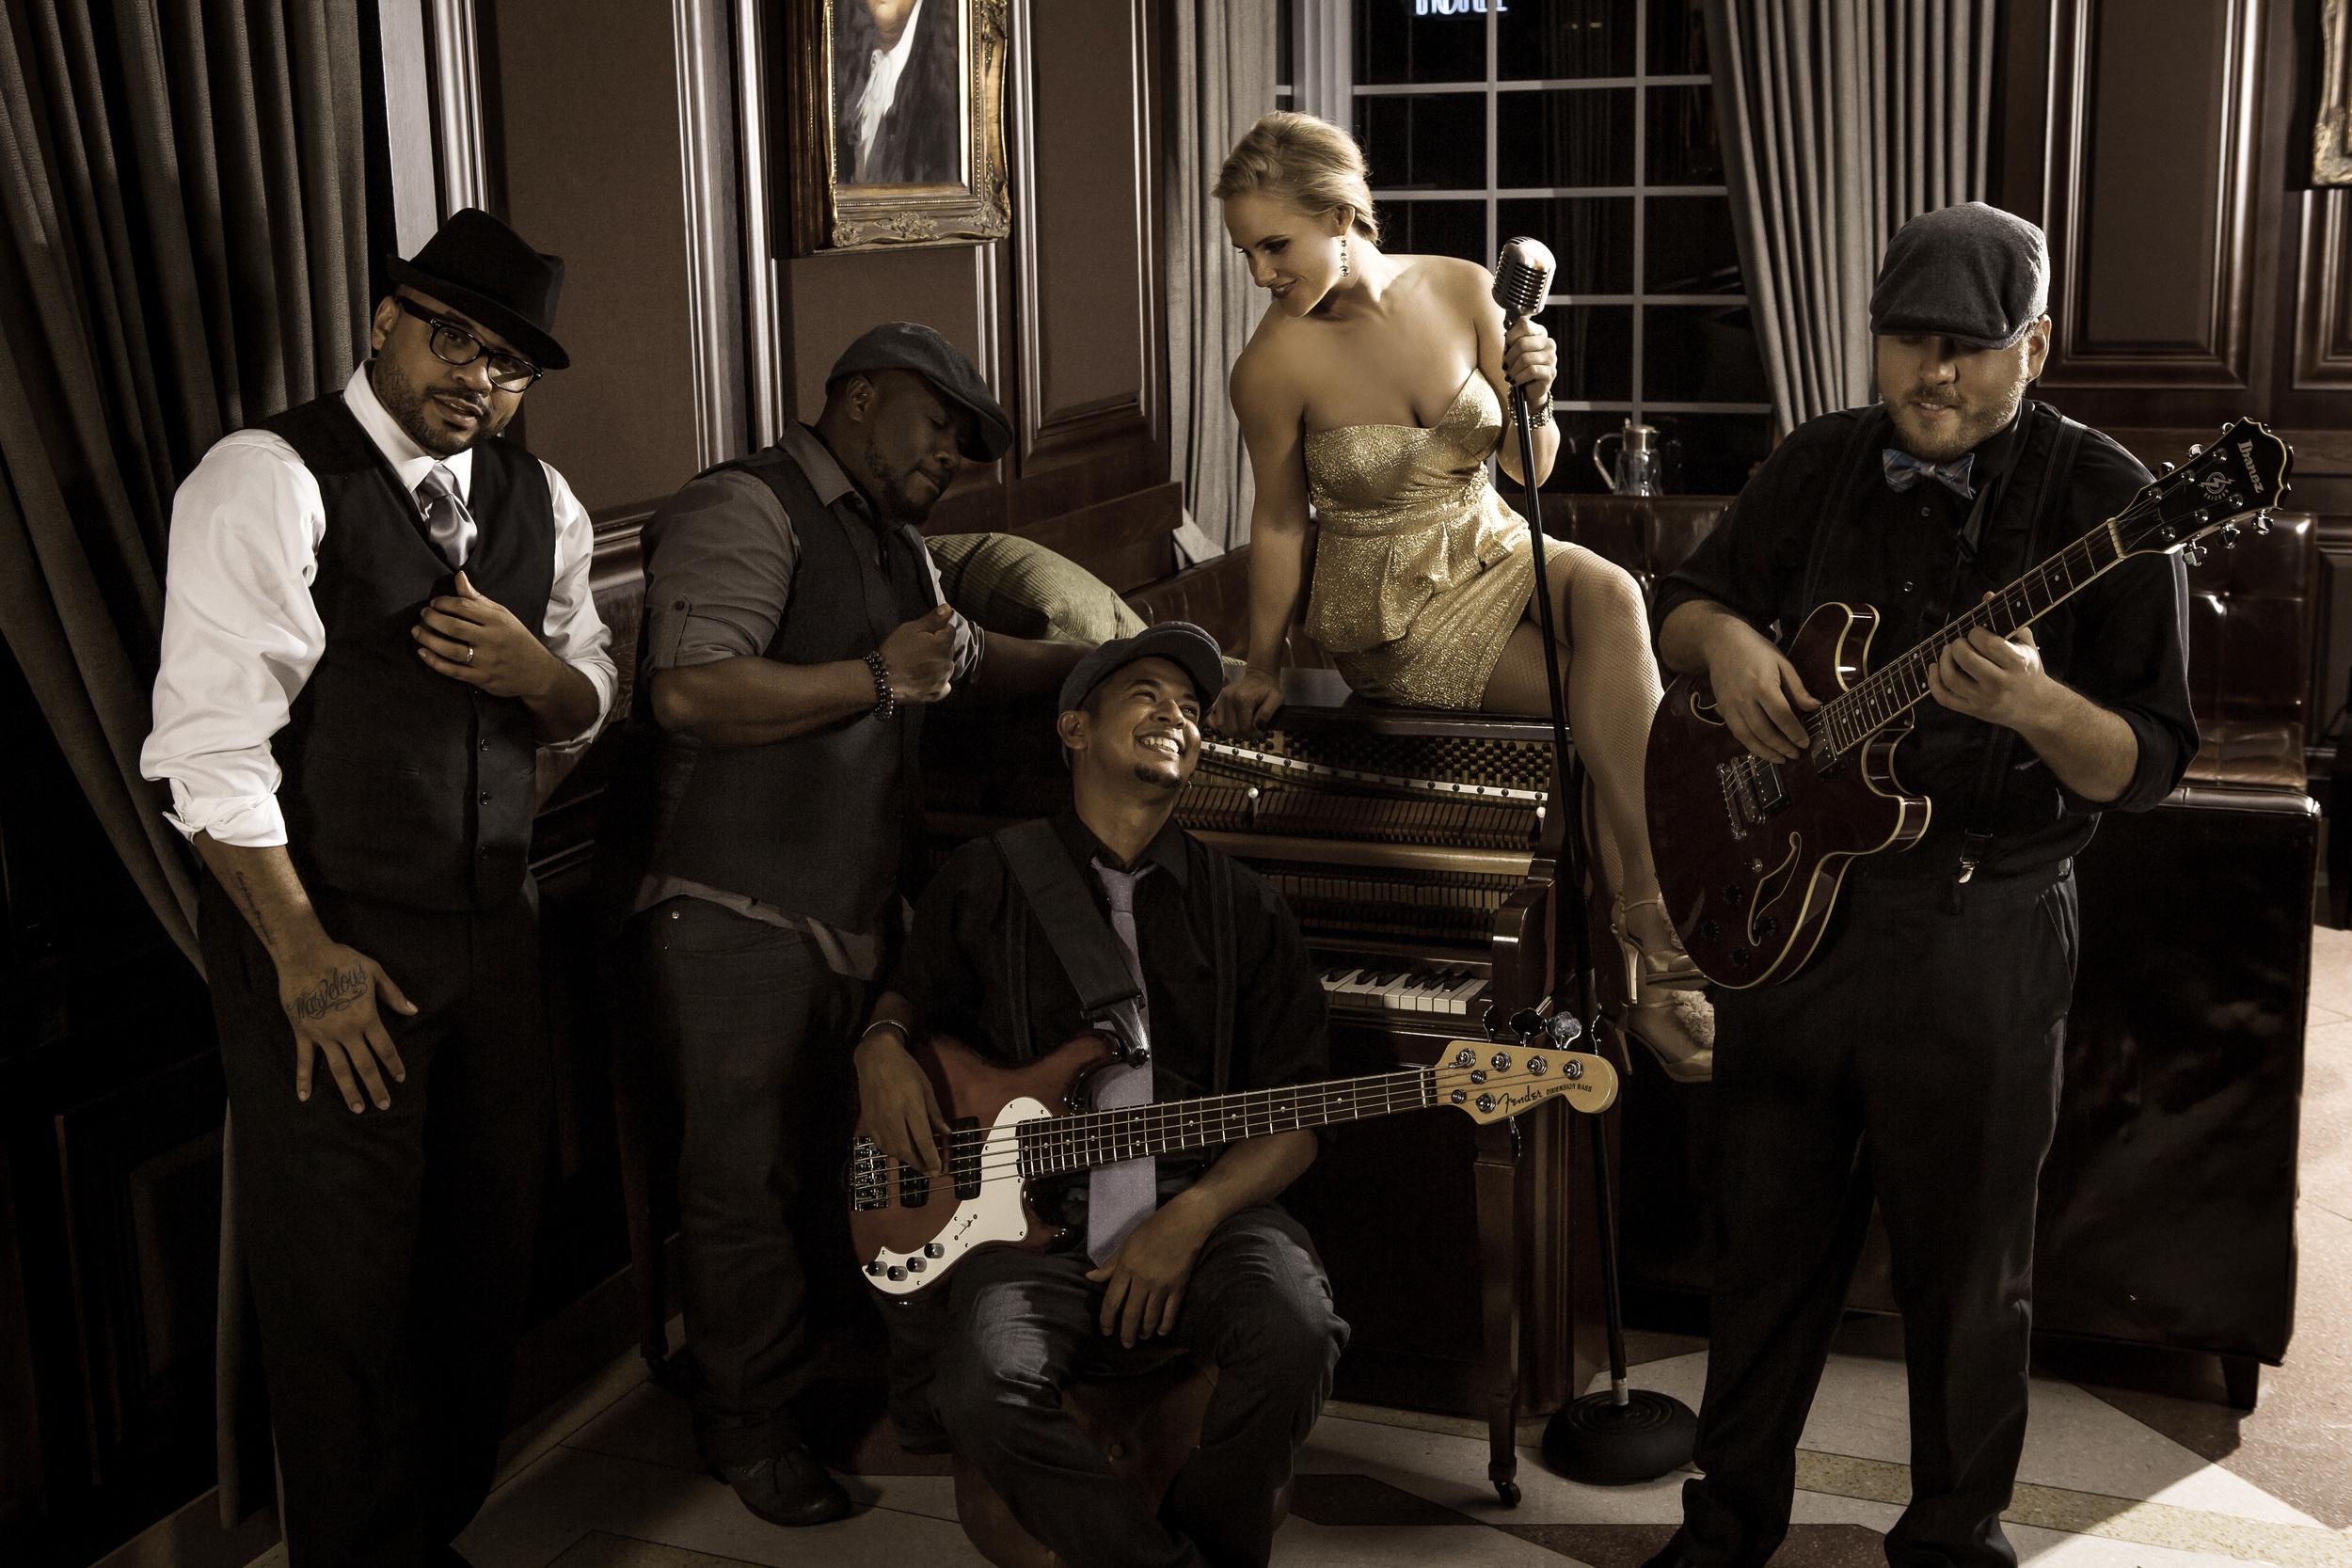 Kitty Carmichael and Band, The Regent, Miami Beach, Florida USA December 2013